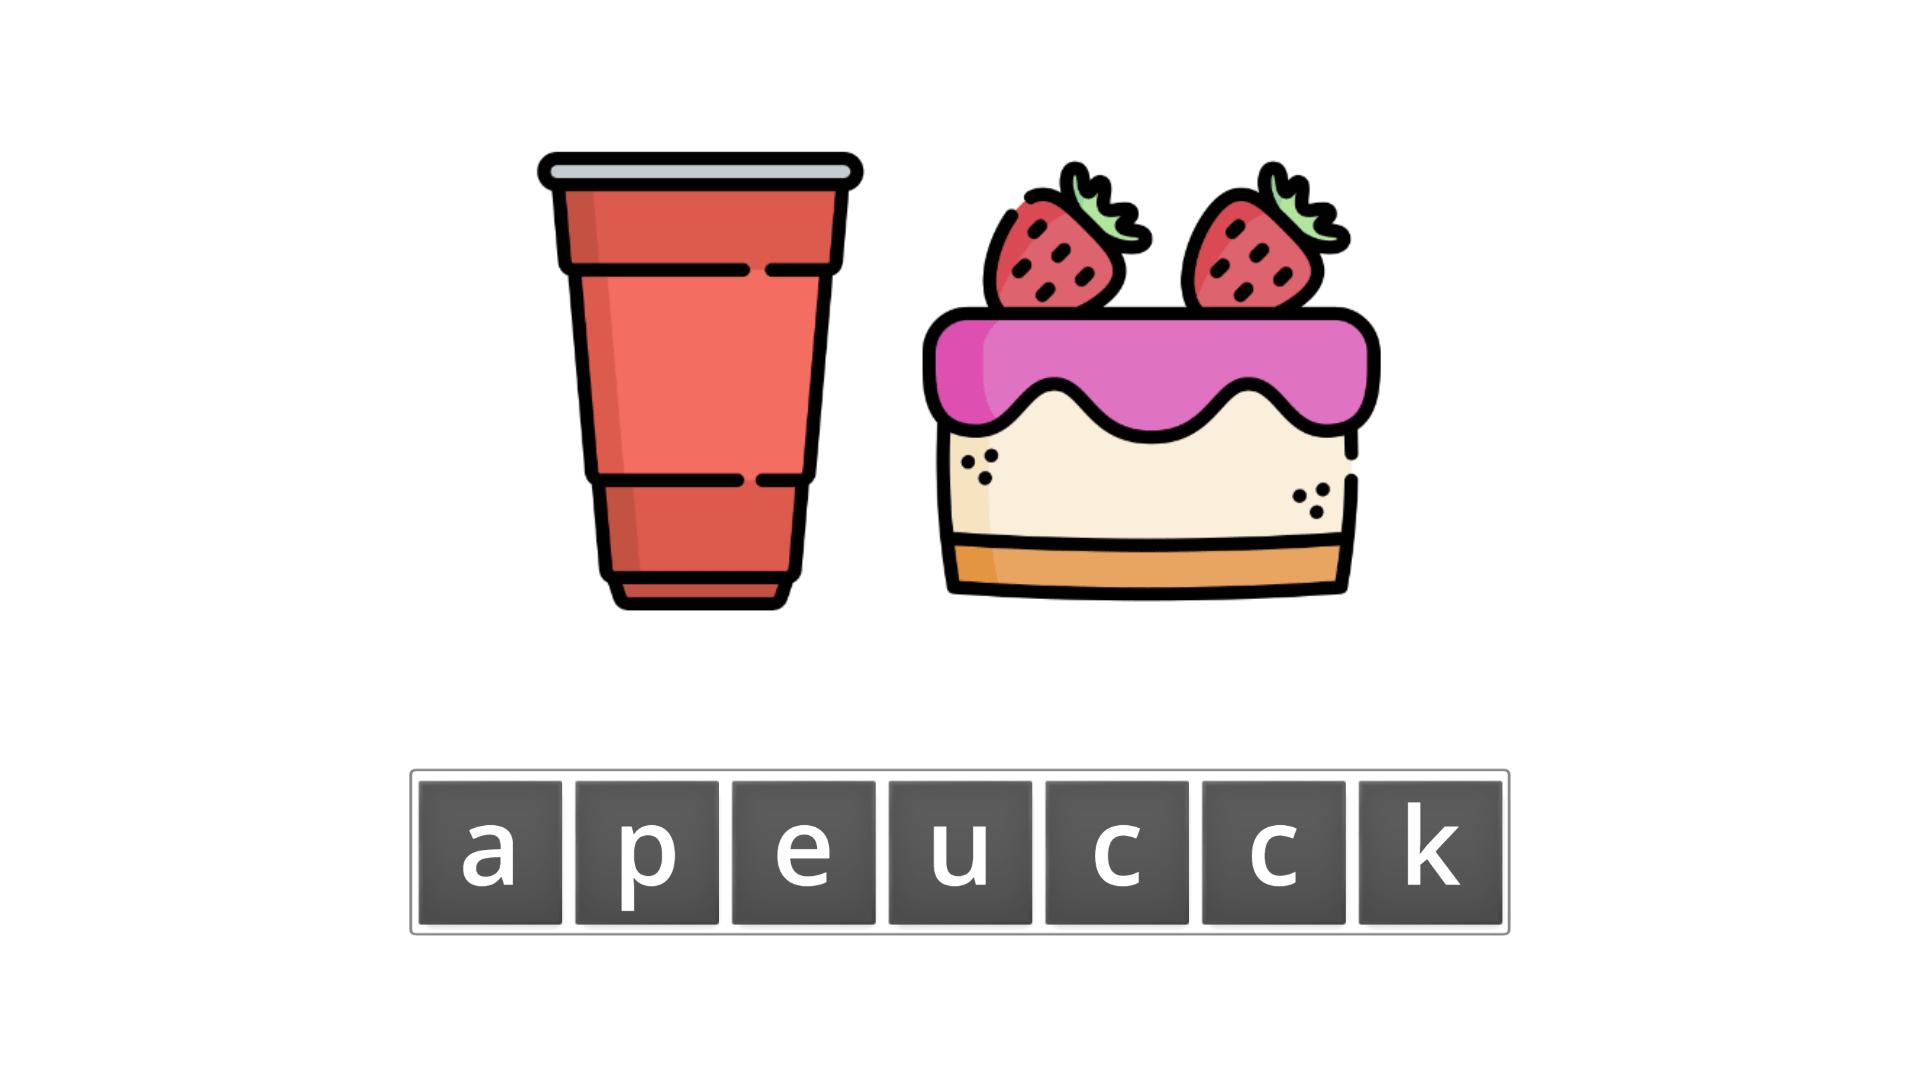 esl resources - flashcards - compound nouns  - unscramble - cupcake